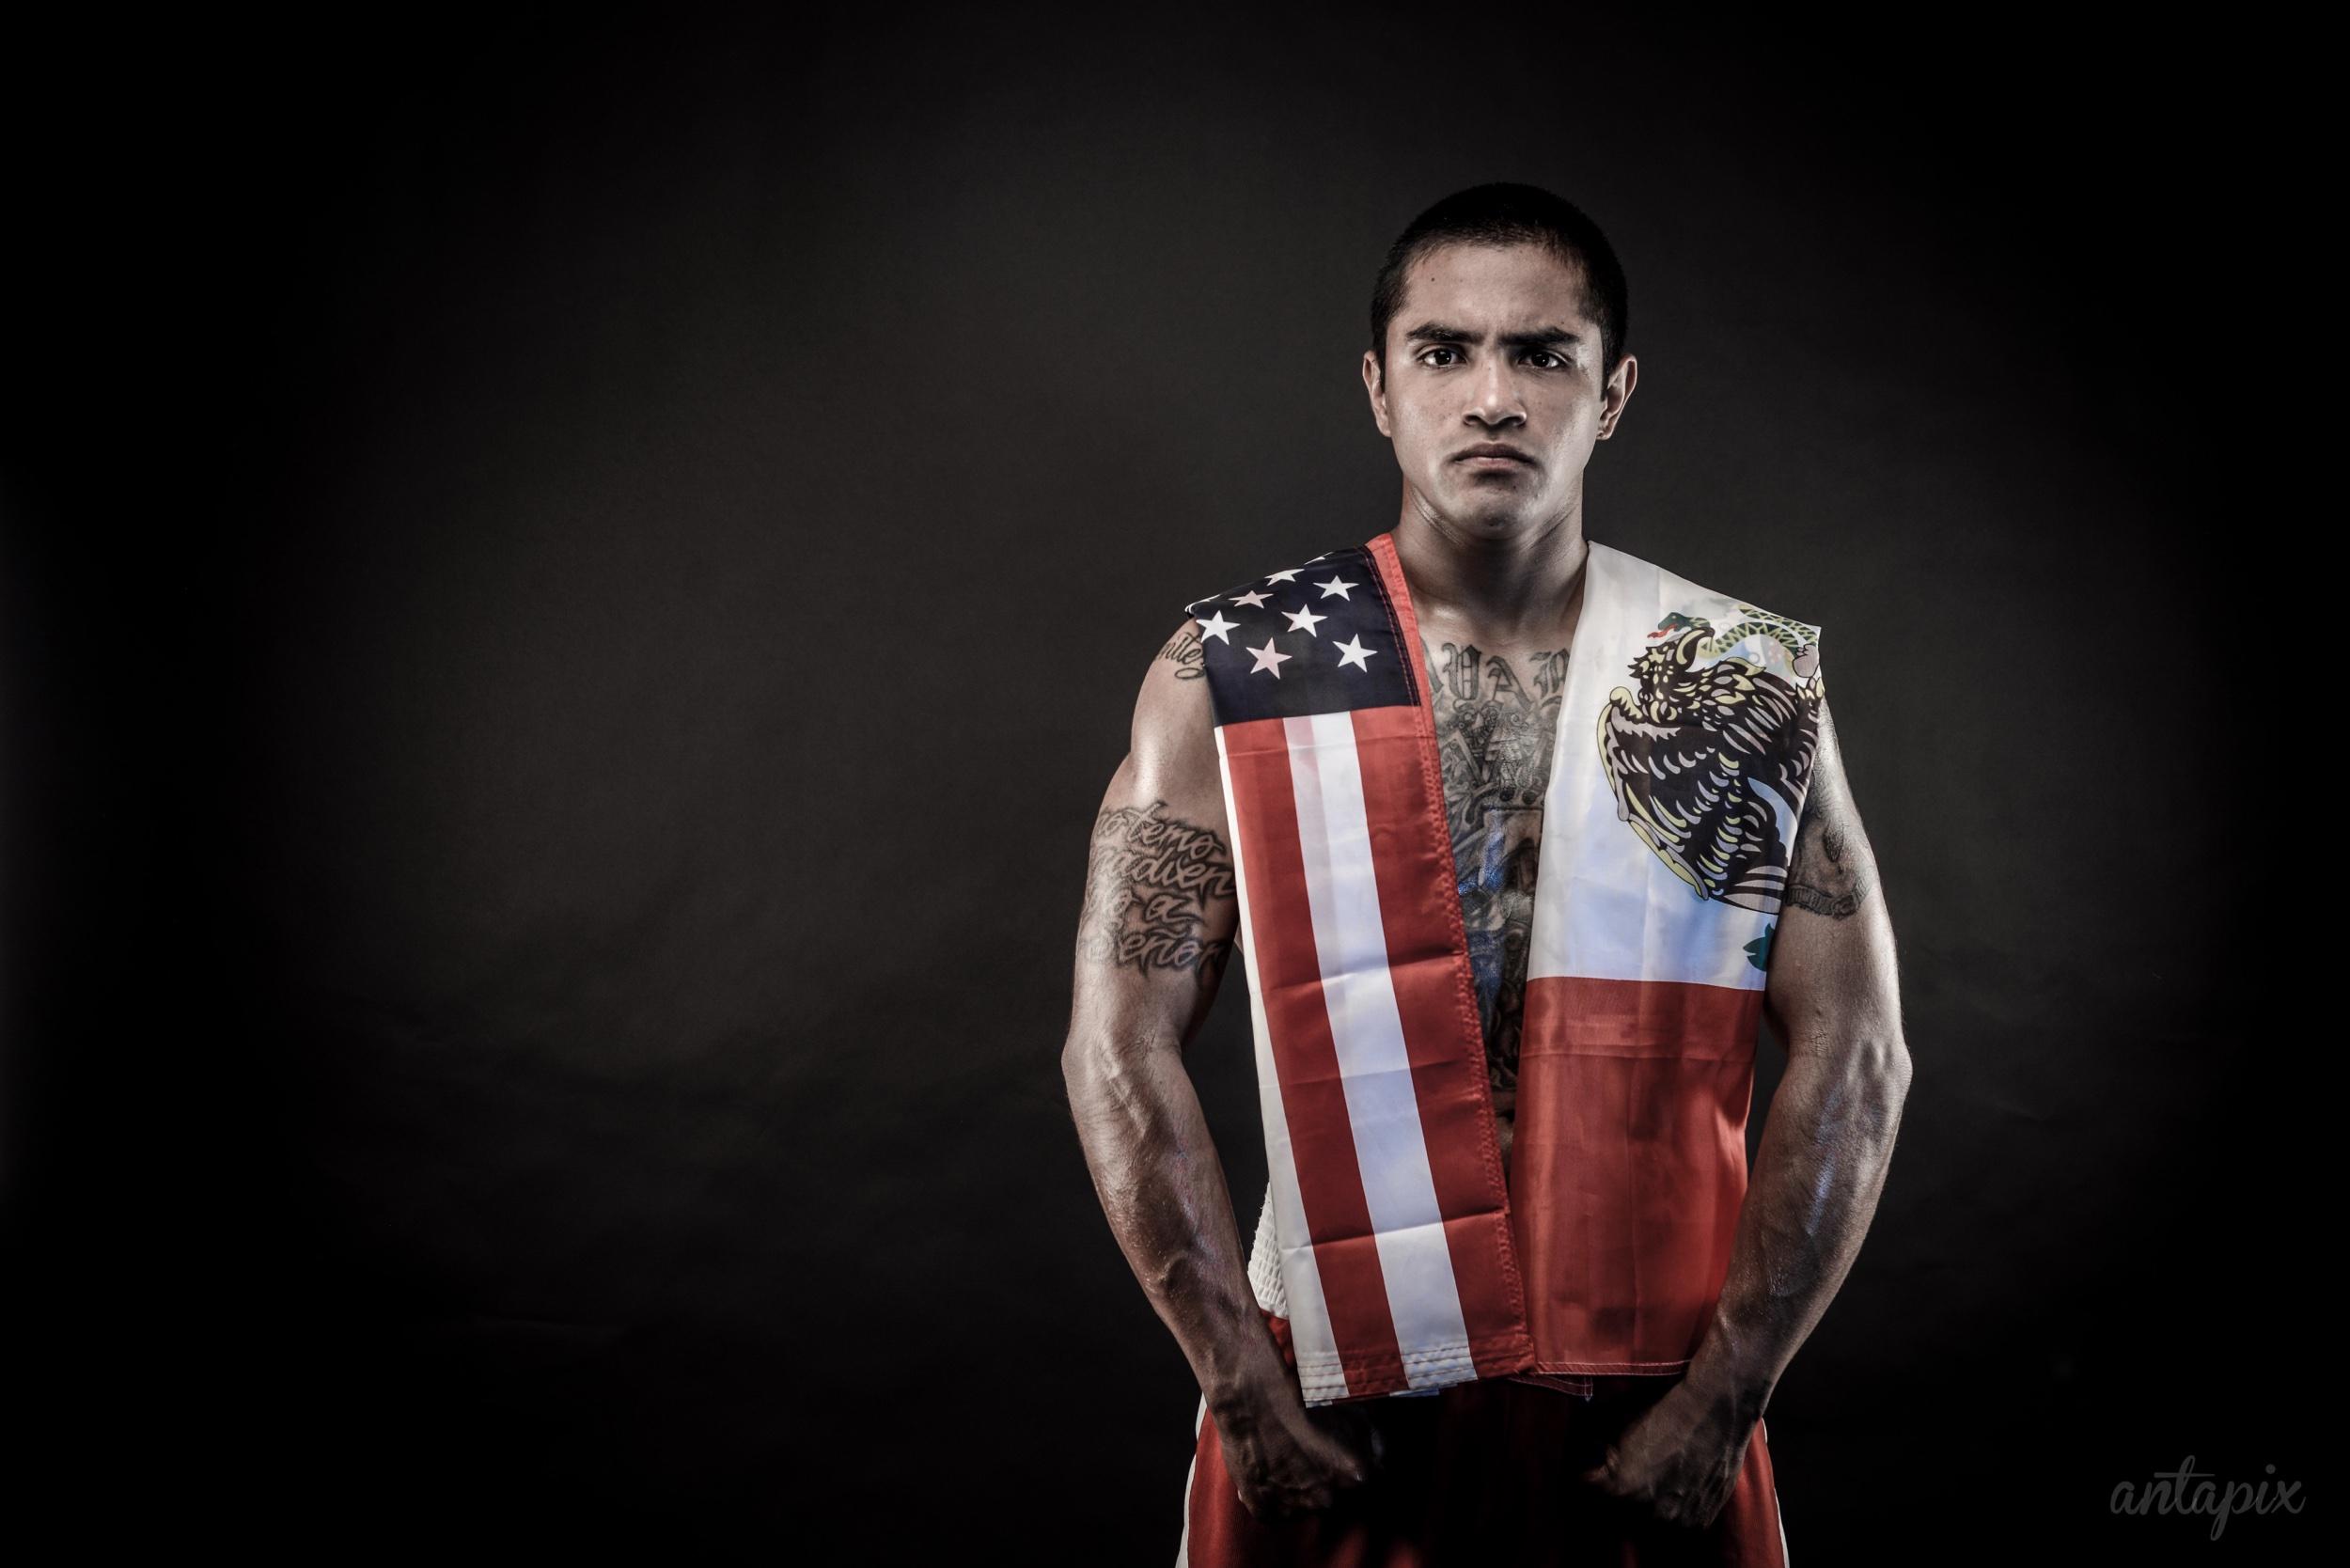 boxing_antapix_smIDV_7062.jpeg